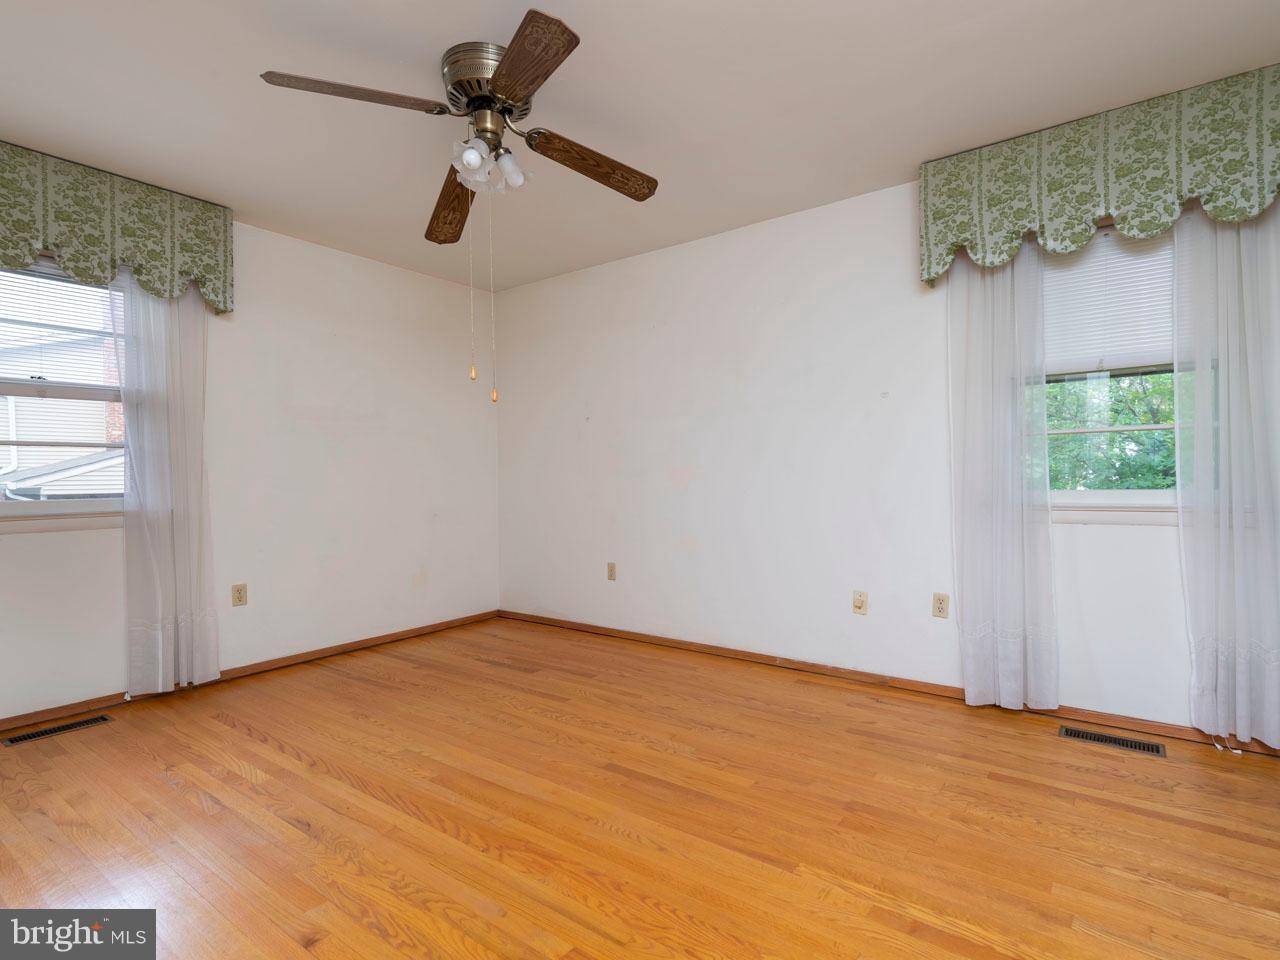 VAFX300106-301103781167-2021-09-05-14-14-29  |   | Alexandria Delaware Real Estate For Sale | MLS# Vafx300106  - Best of Northern Virginia